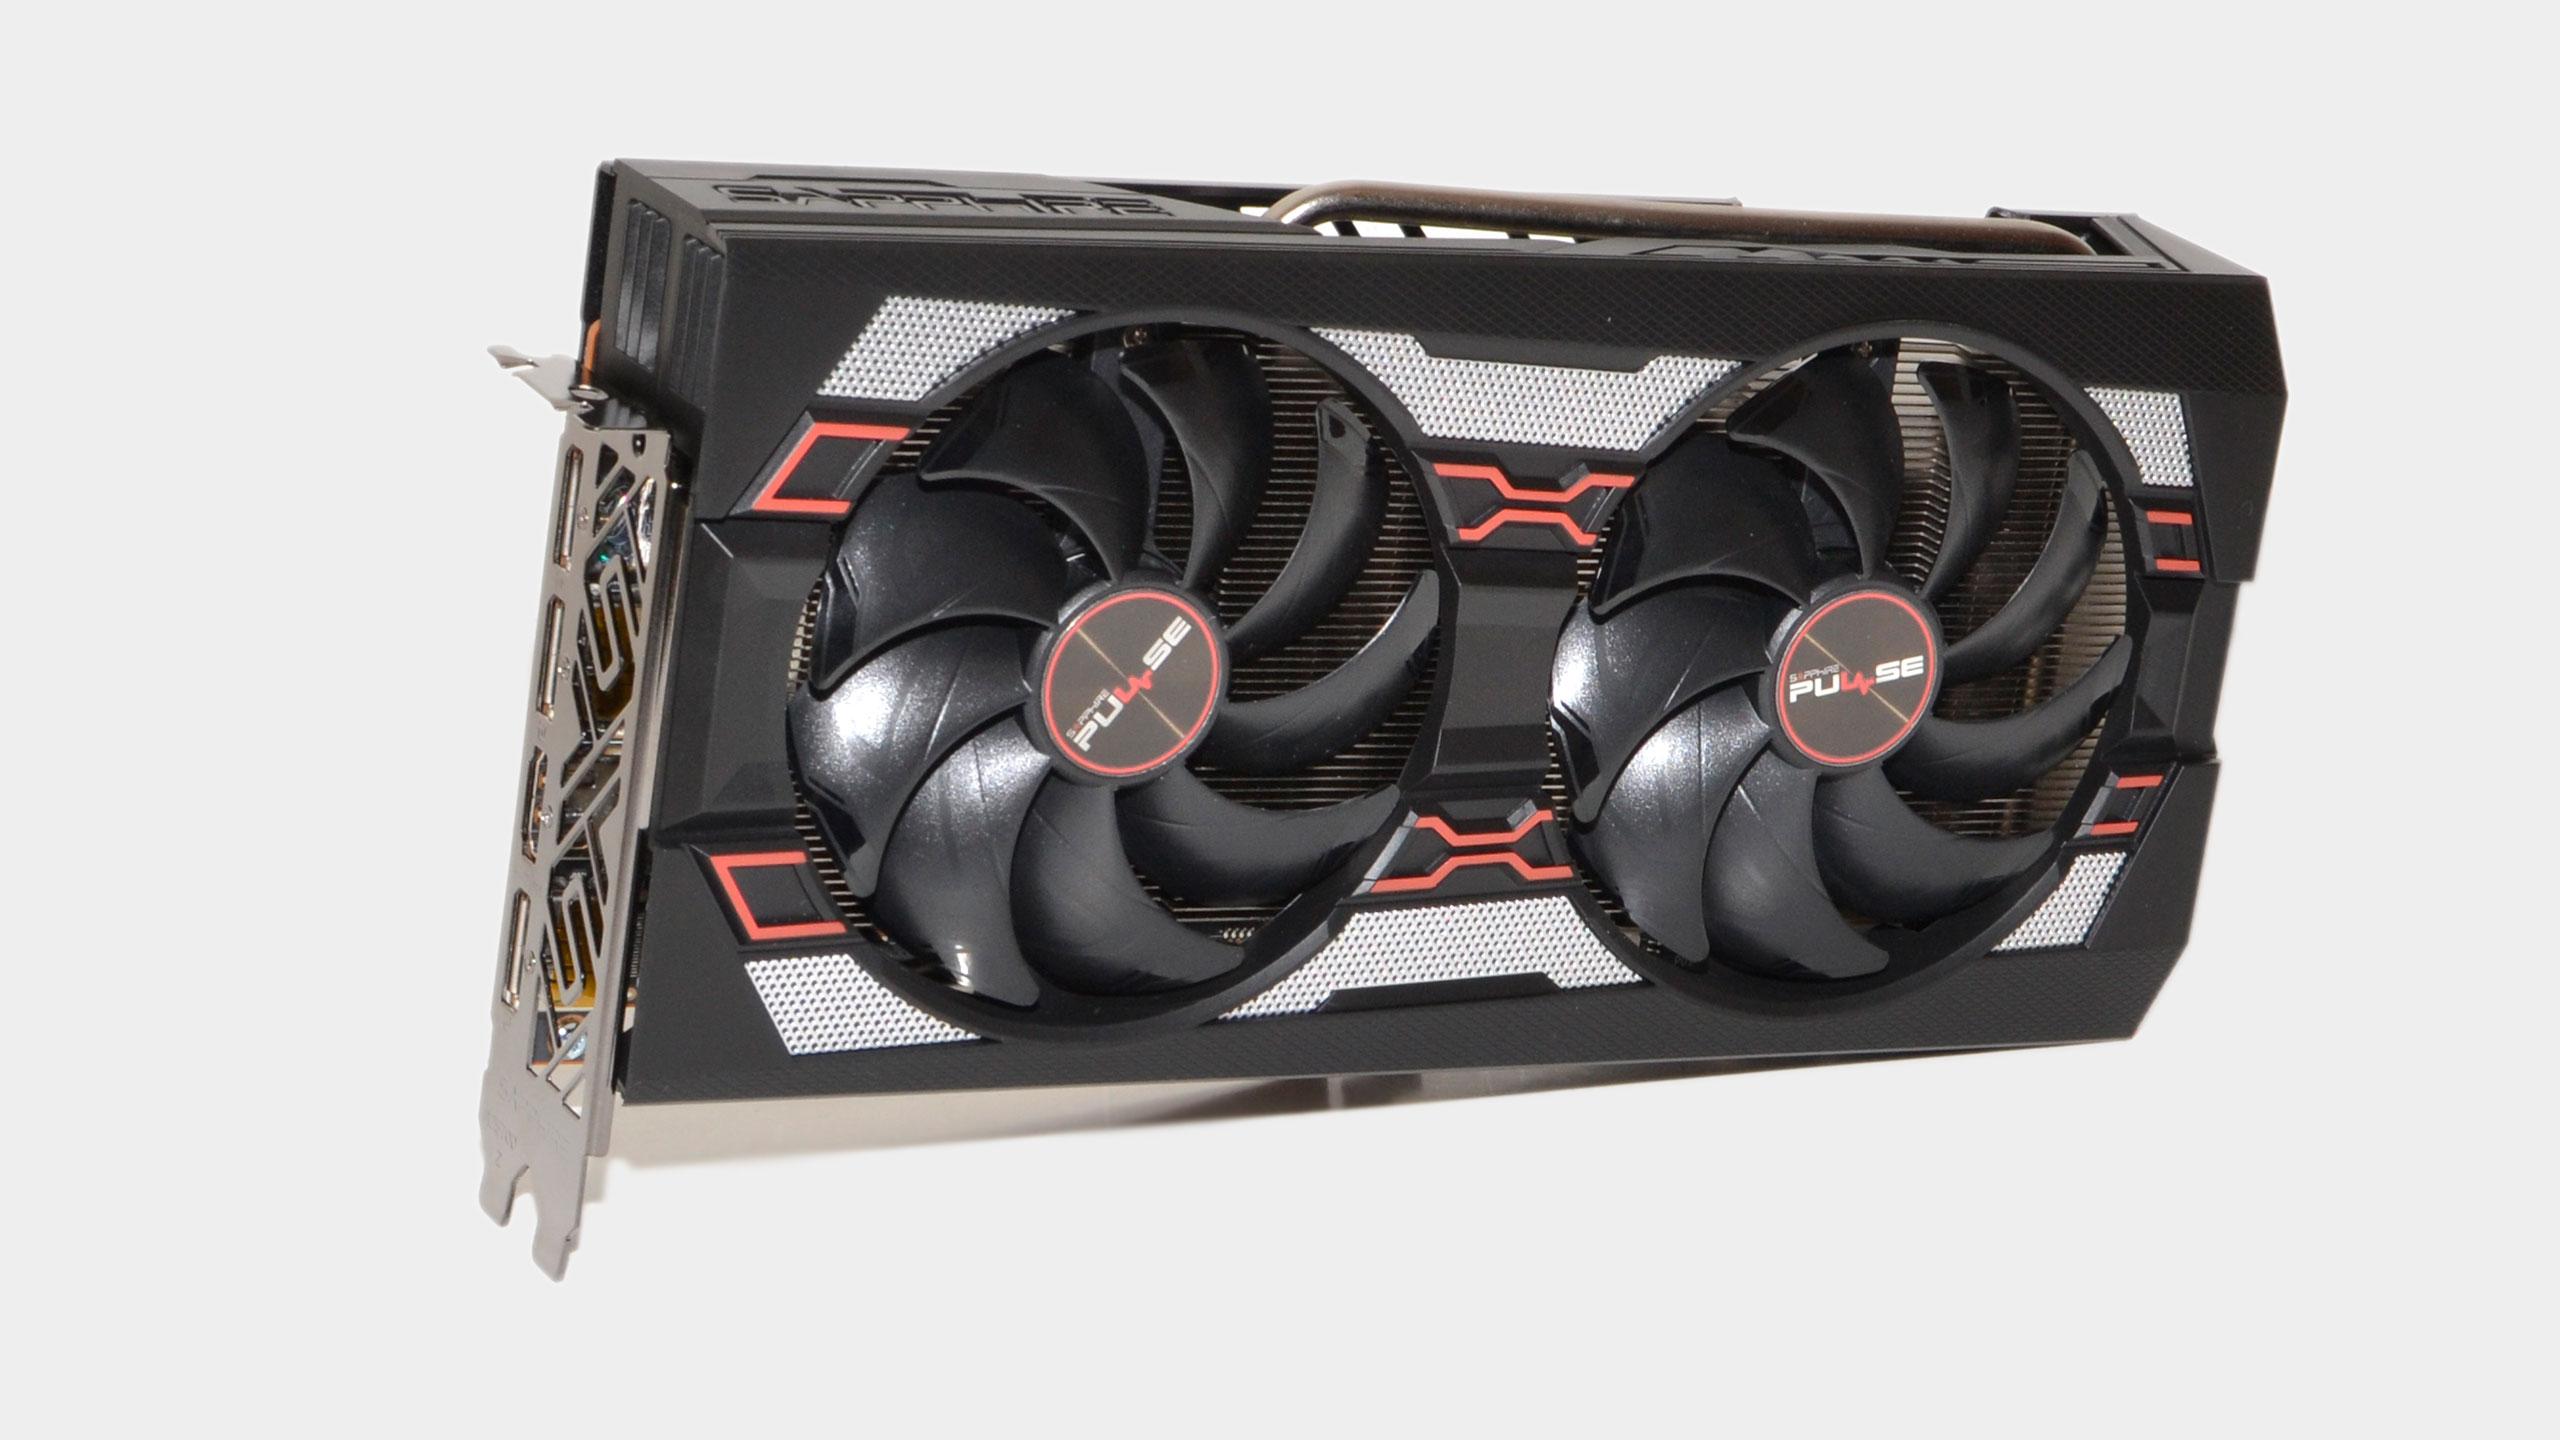 Amd Radeon Rx 5600 Xt Review Pc Gamer